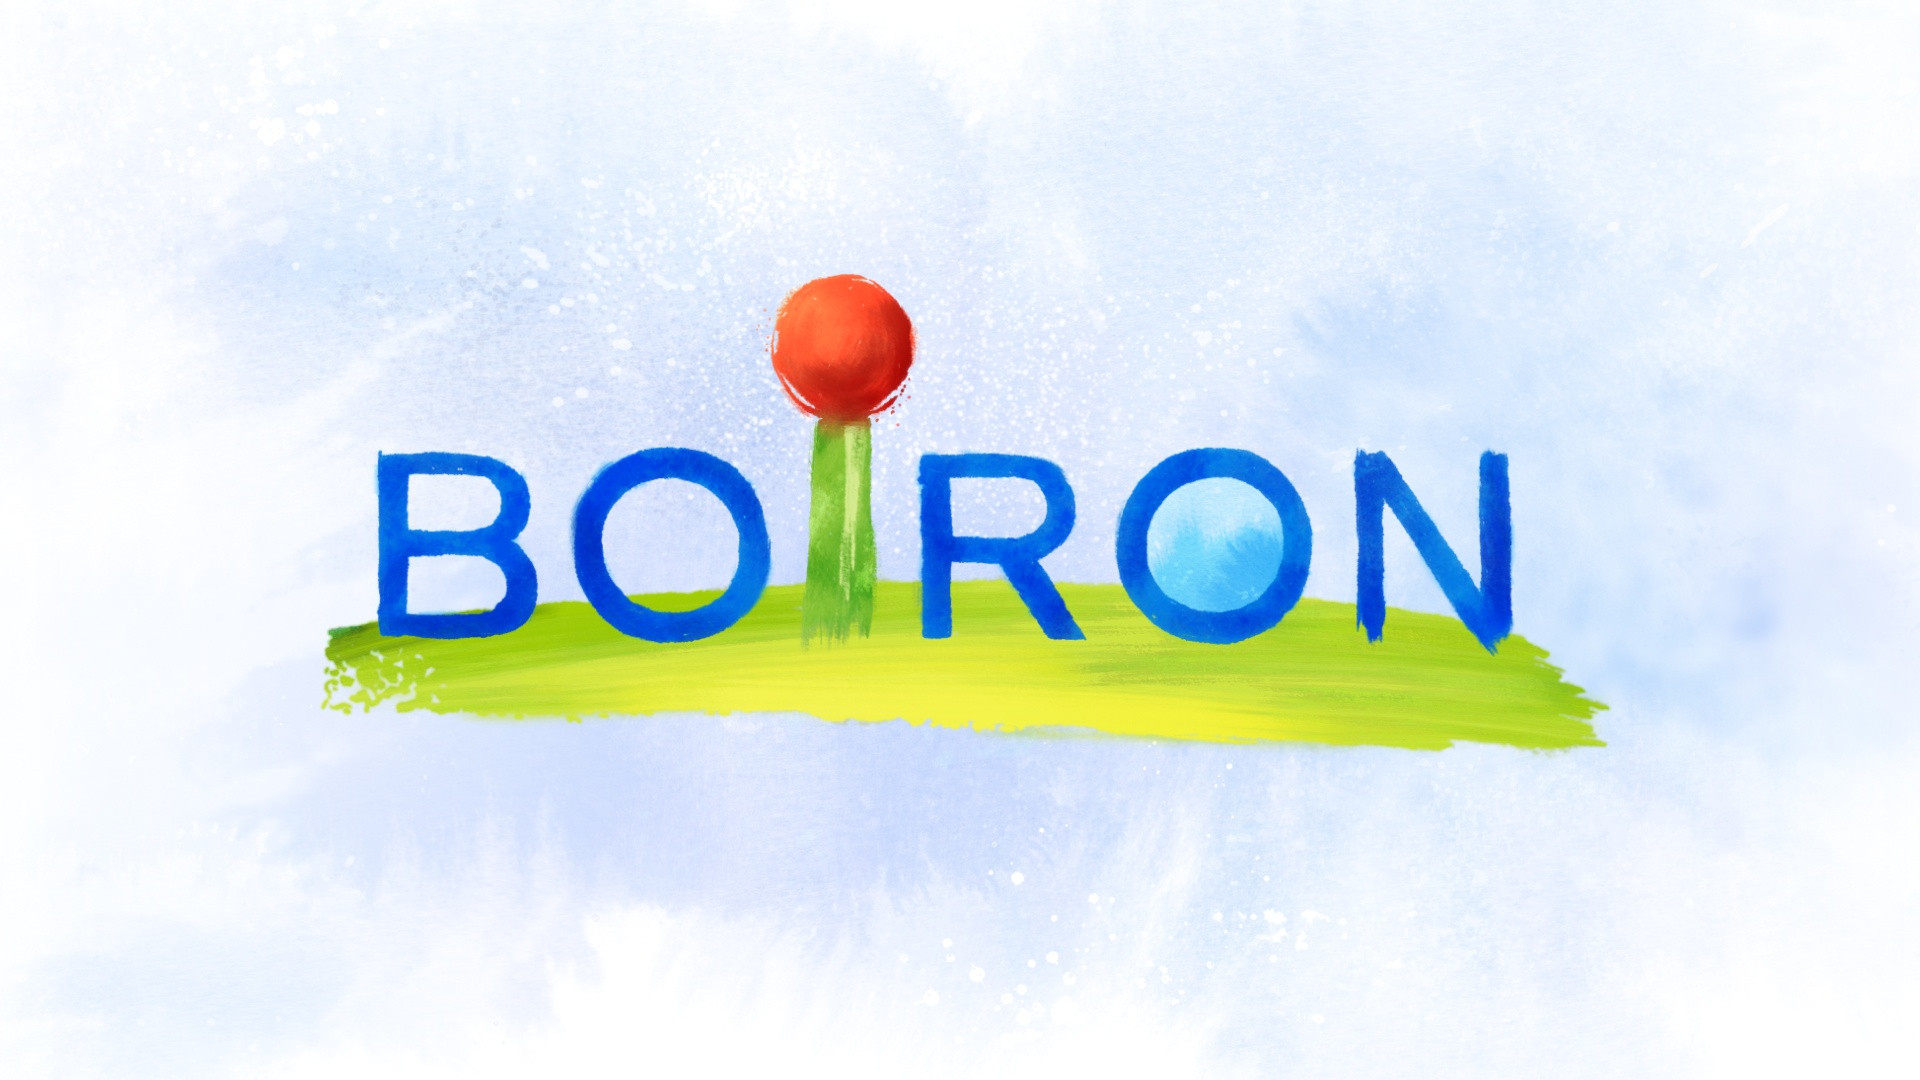 boiron-91007.jpg